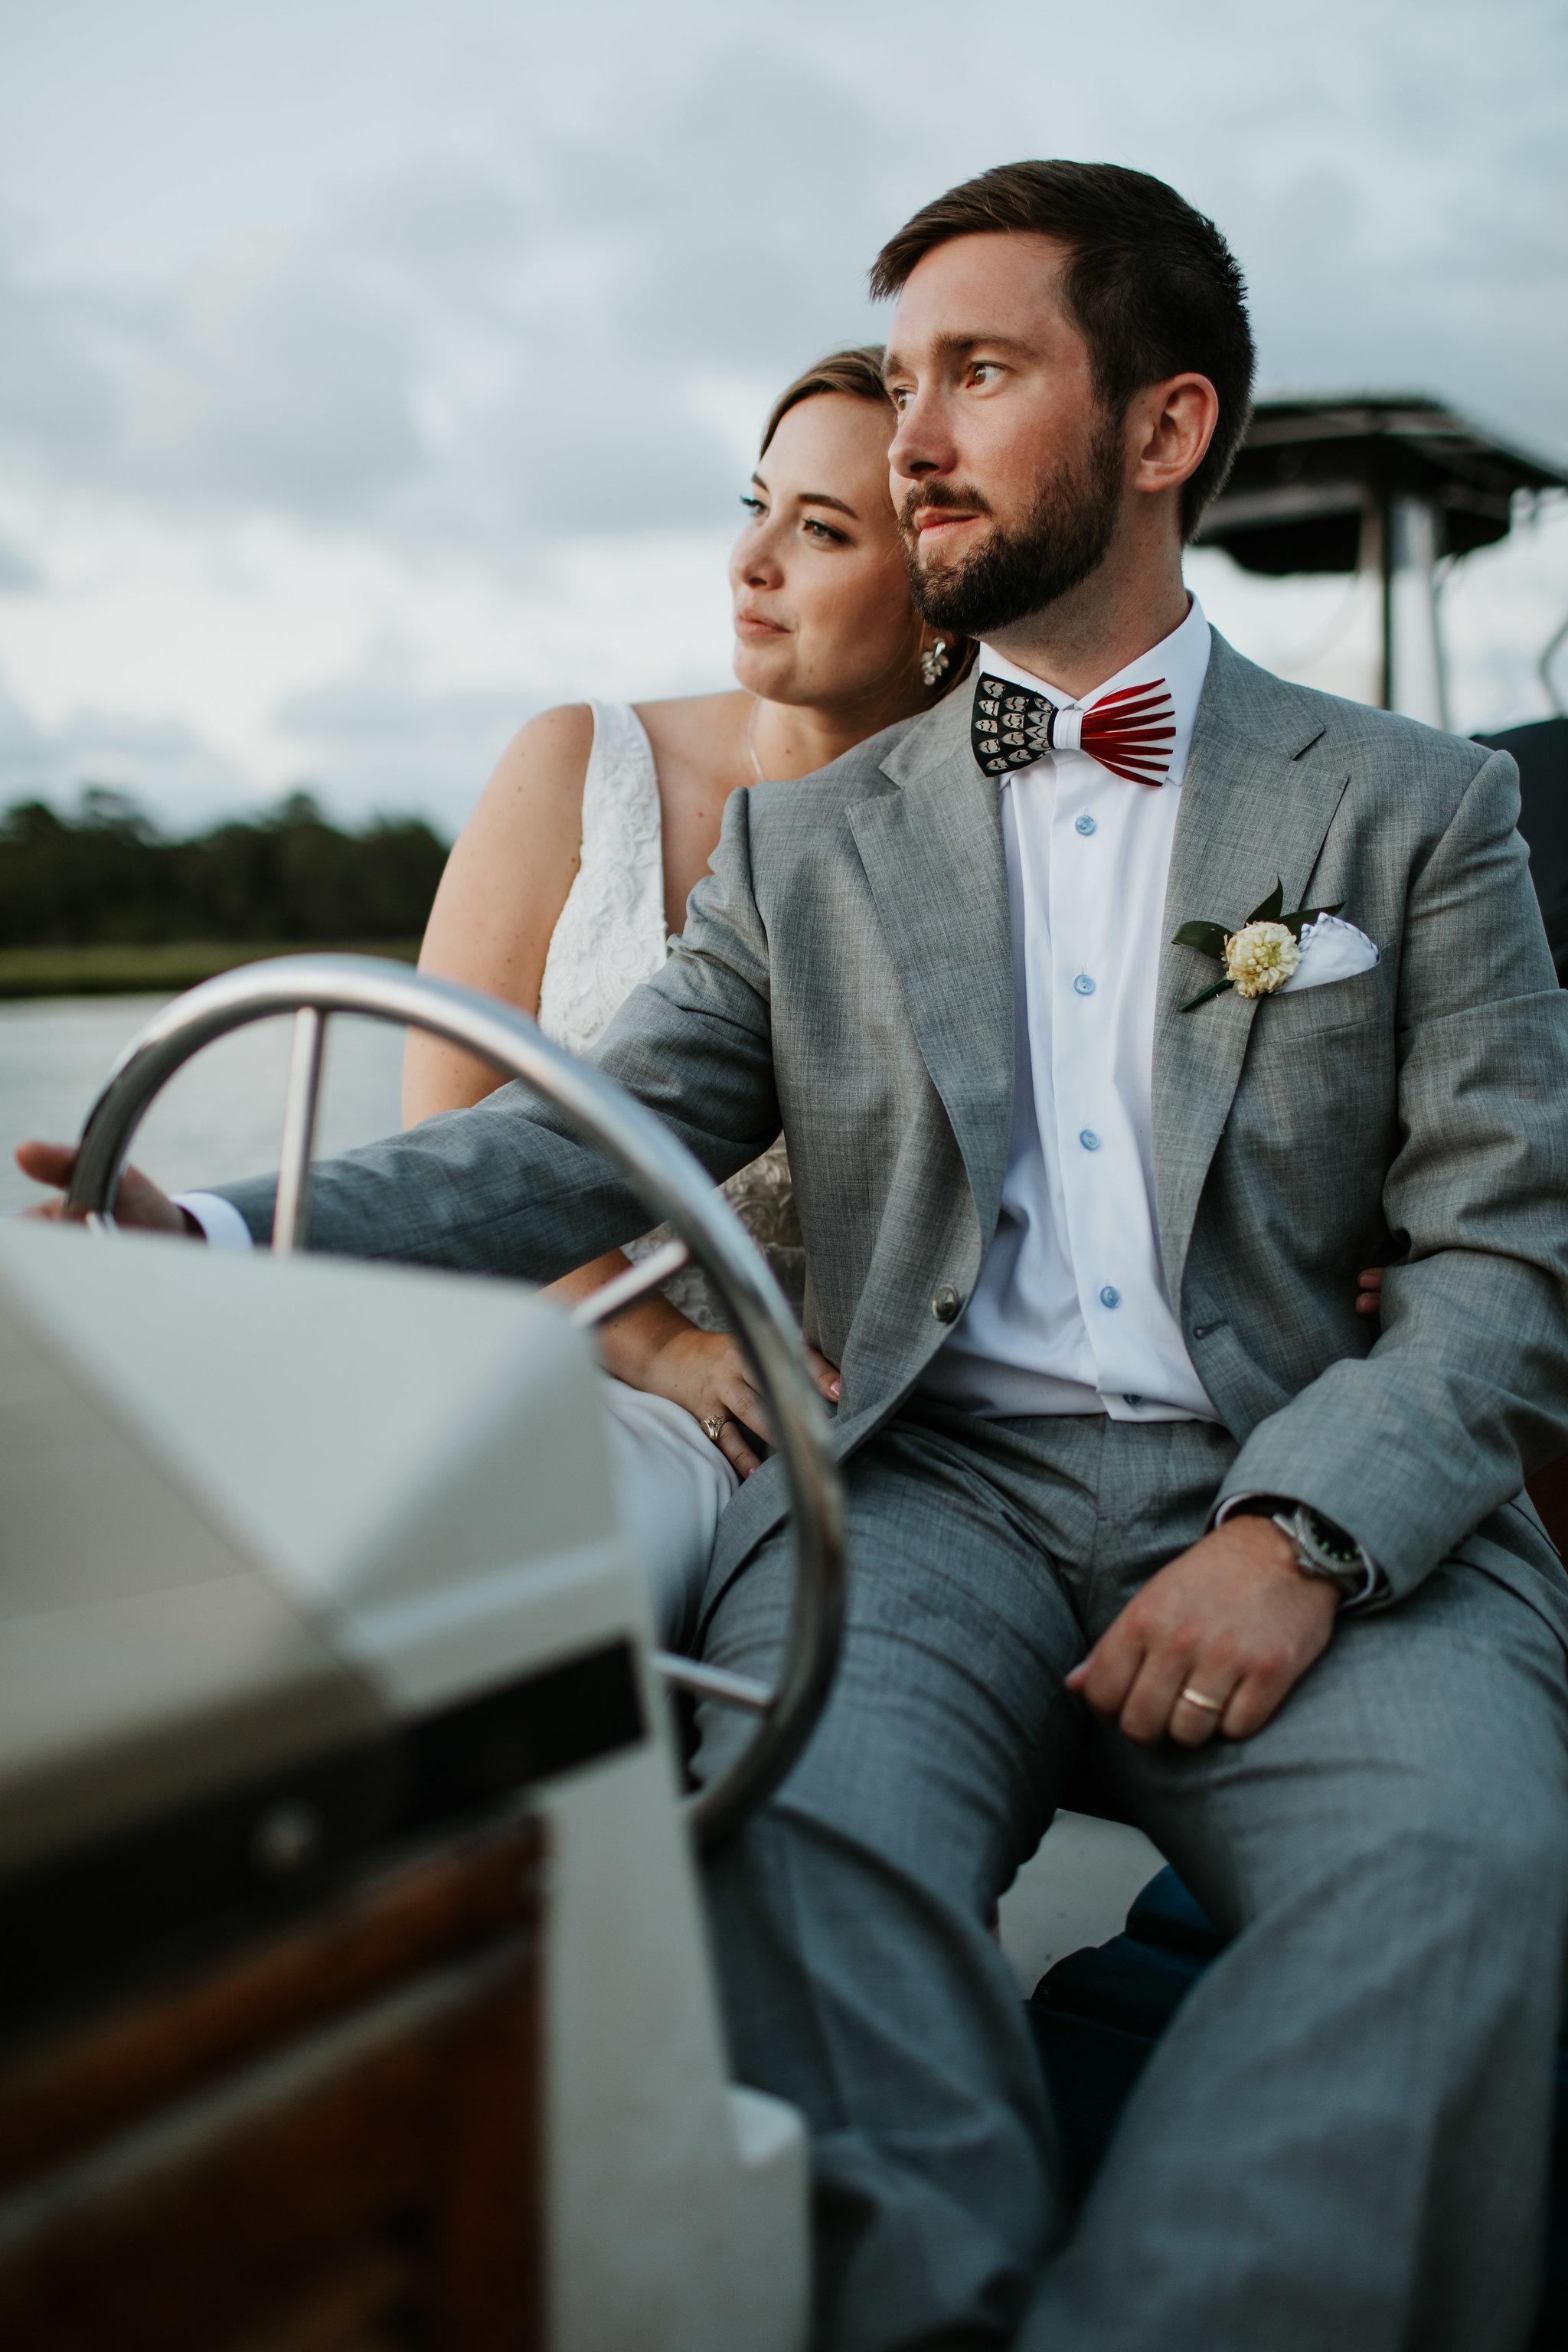 Creekclub-at-Ion-Charleston-SC-wedding-portrait-photographer-397.jpg